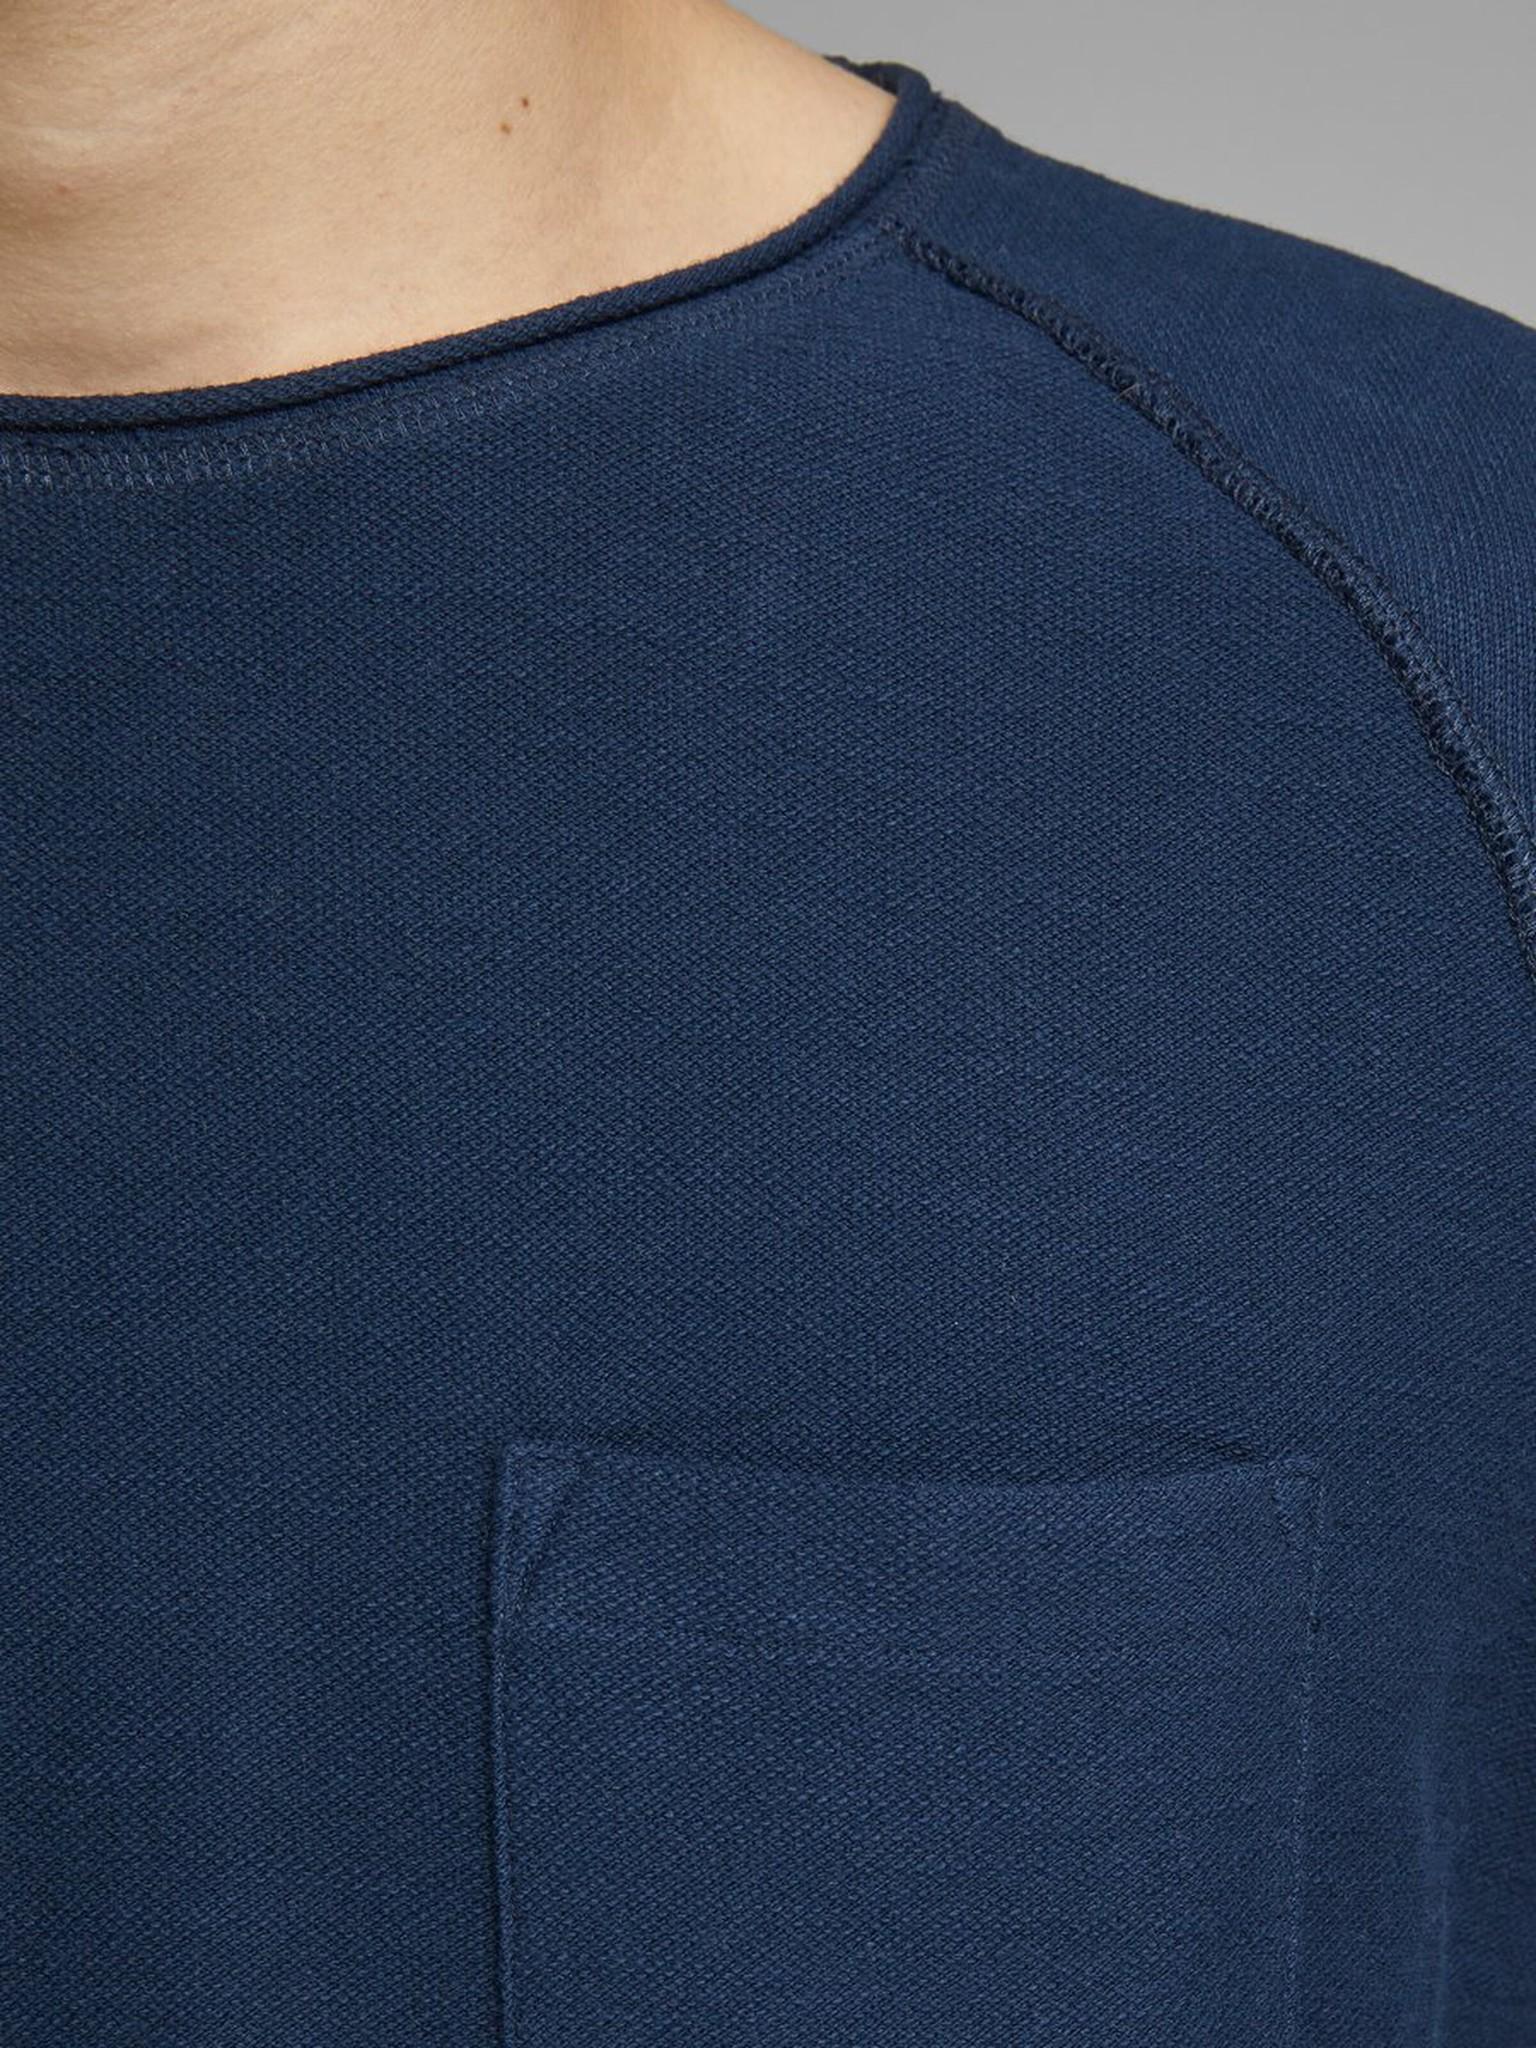 JACK & JONES col ras-du-cou sweat-shirt-5